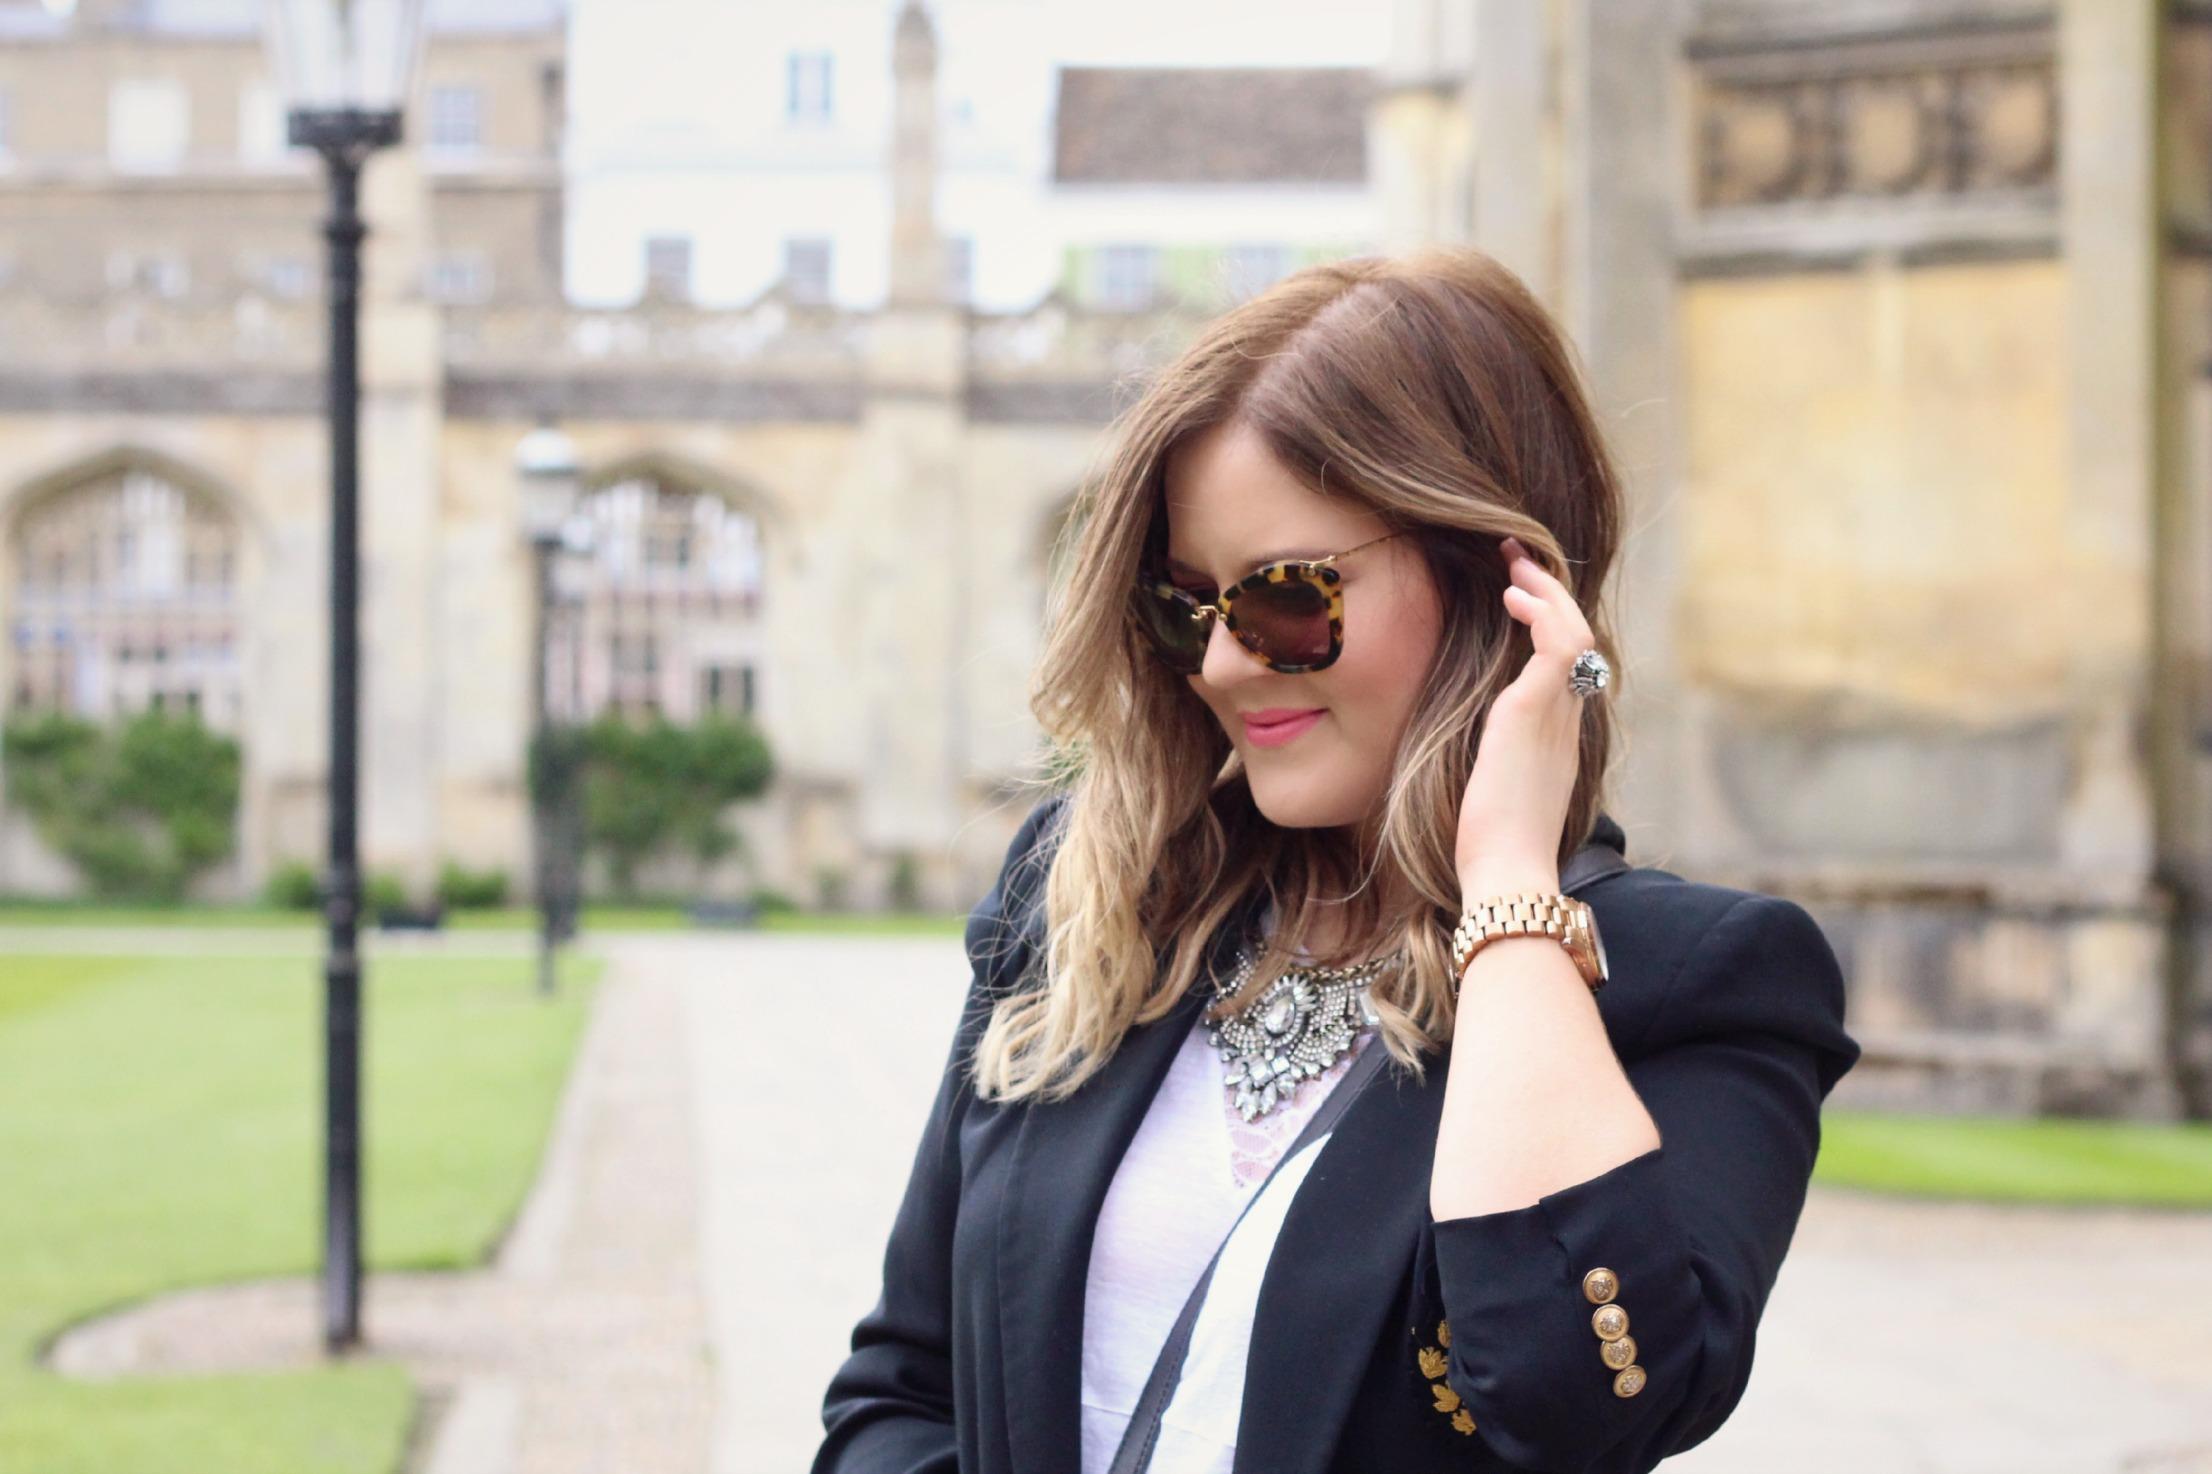 A Girl, A Style _ Miu Miu Tortoishell Sunglasses